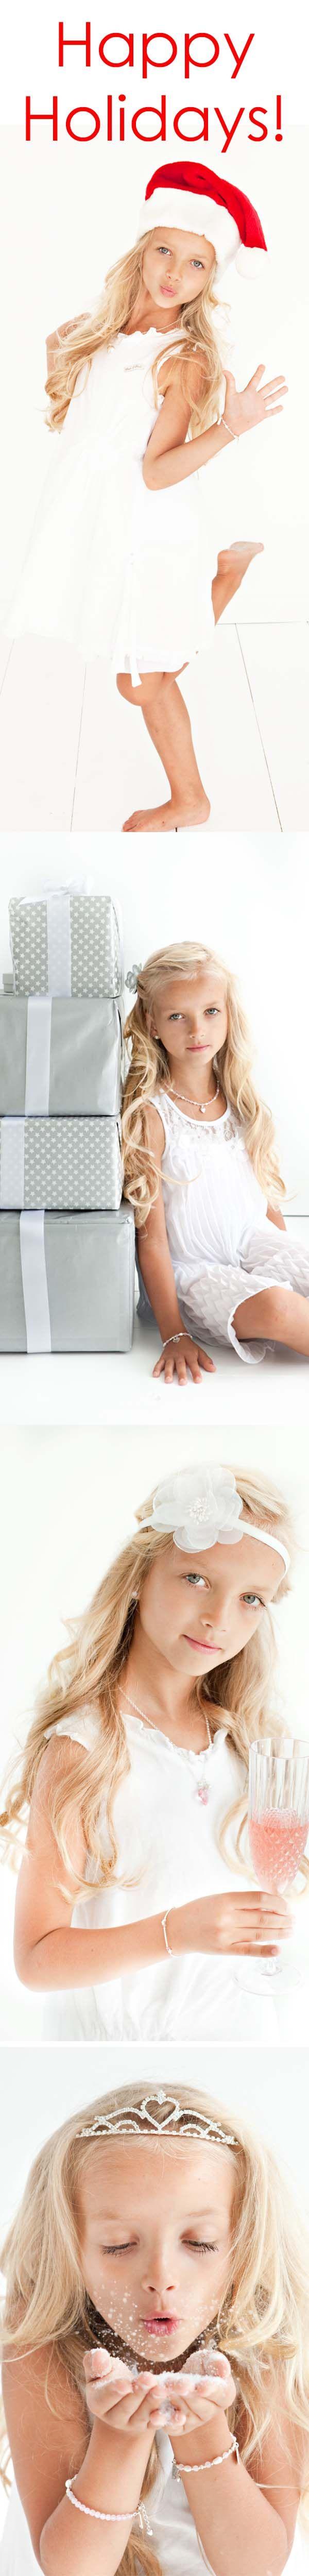 Best wishes from LOVY deluxe kids jewelry <3 www.lovy.nl